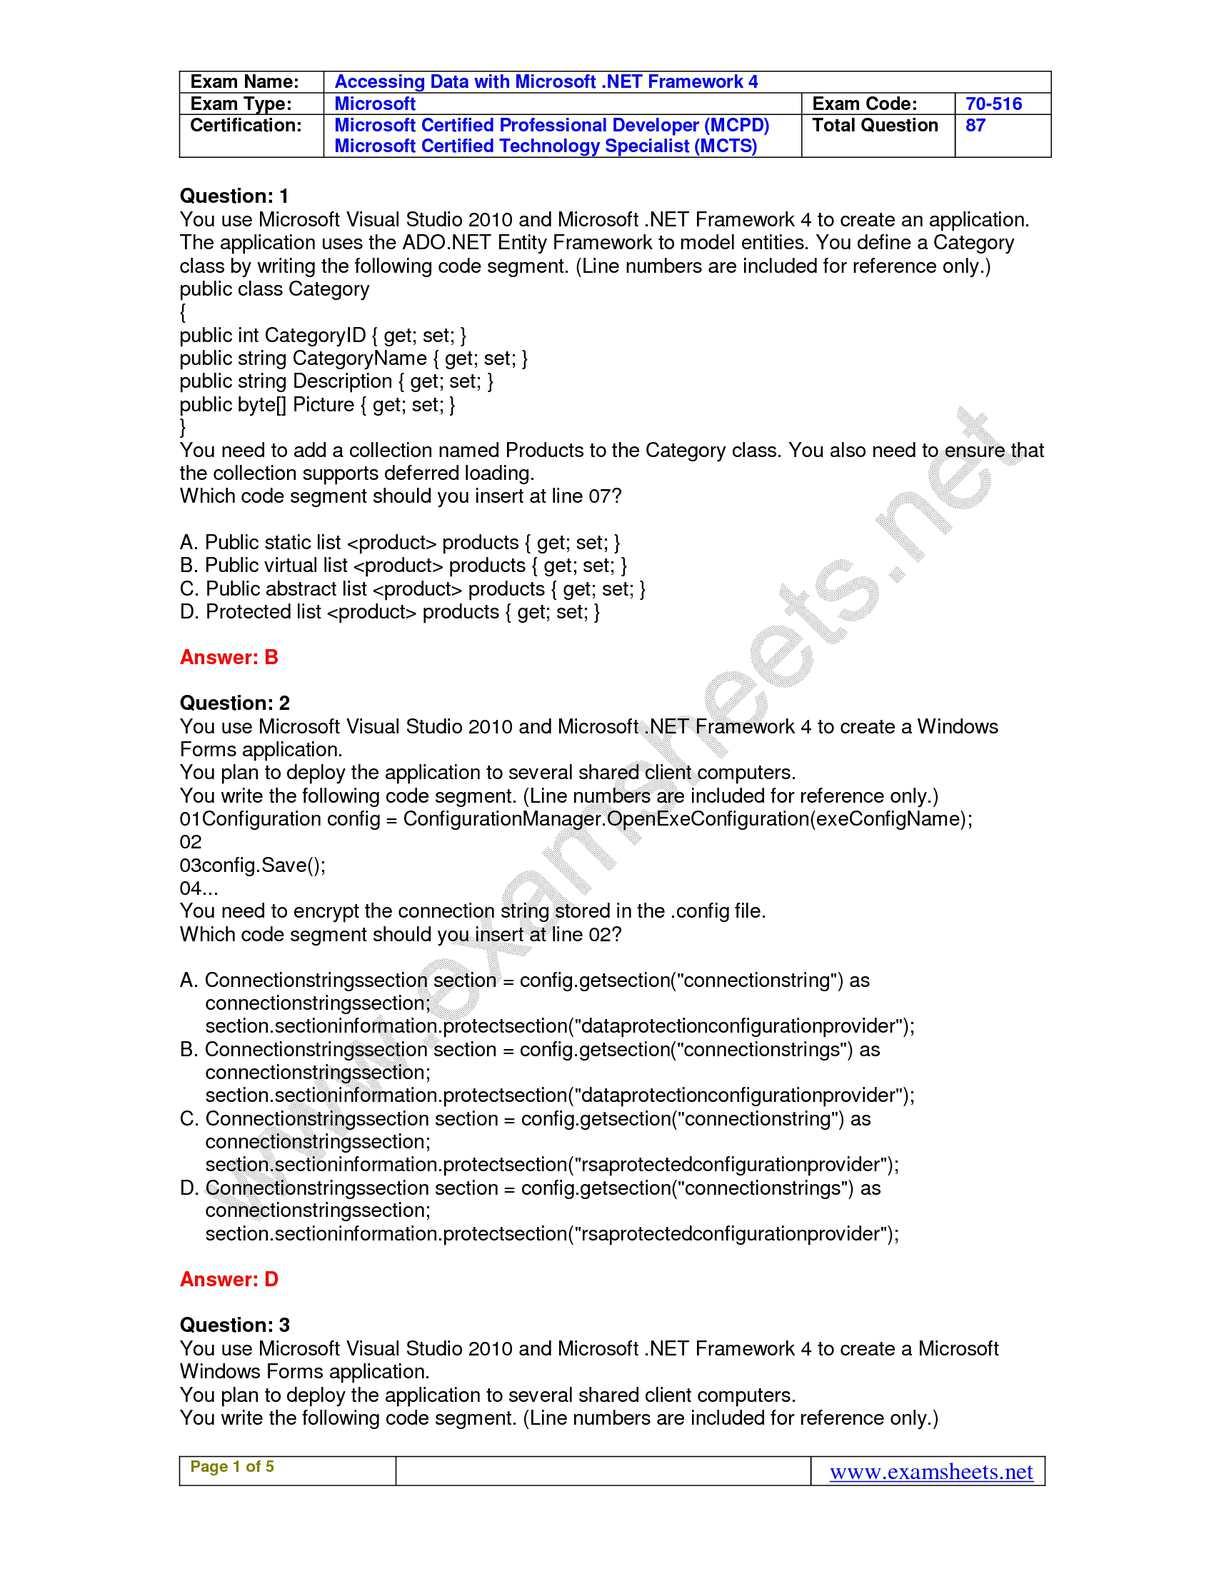 Calamo Exam Sheets 70 516 Practice Exam Questions Microsoft 70